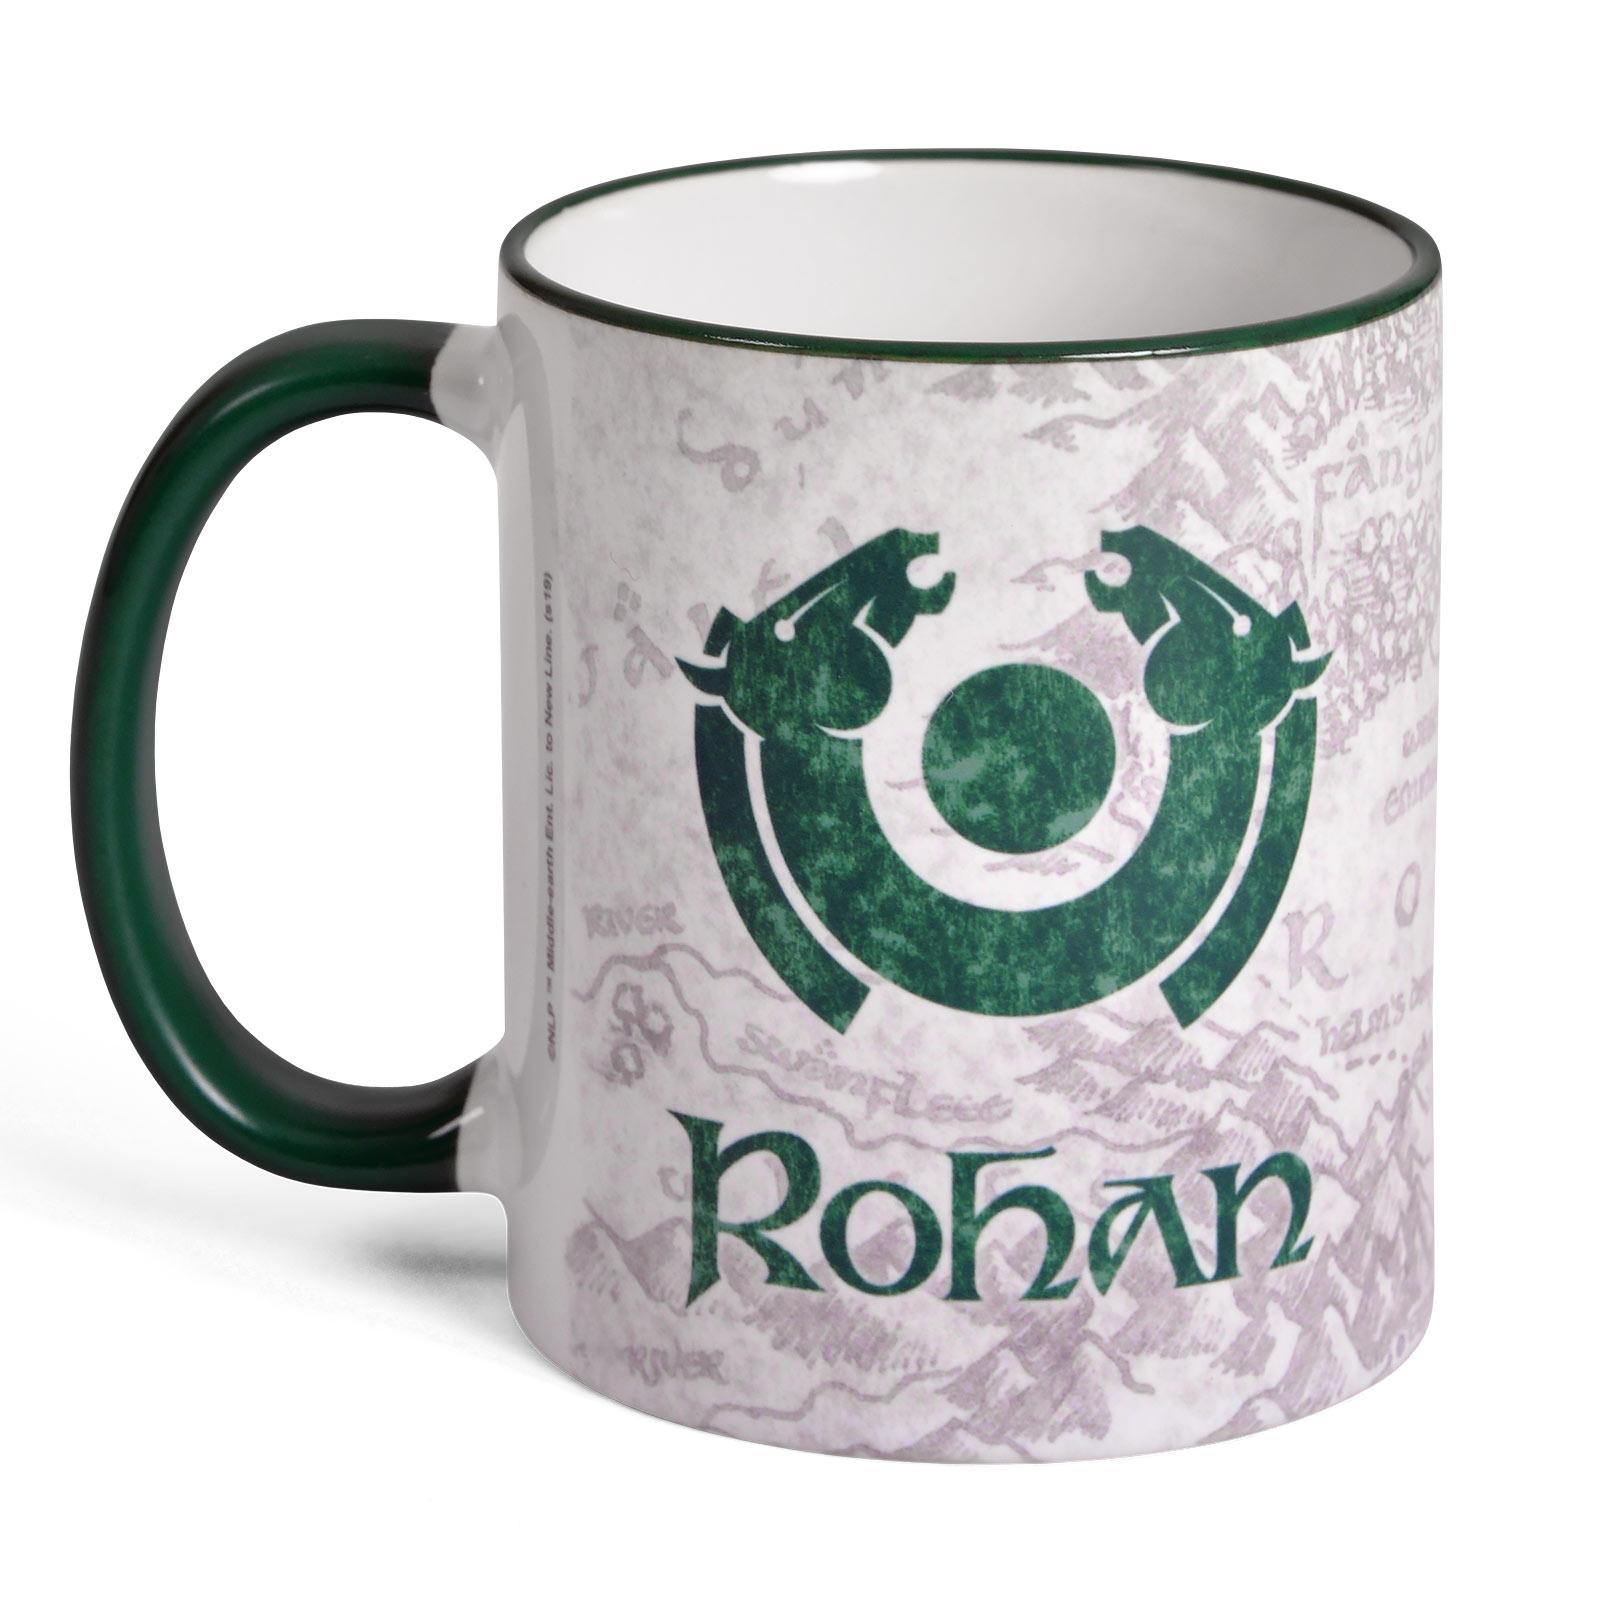 Herr der Ringe - Rohan Tasse